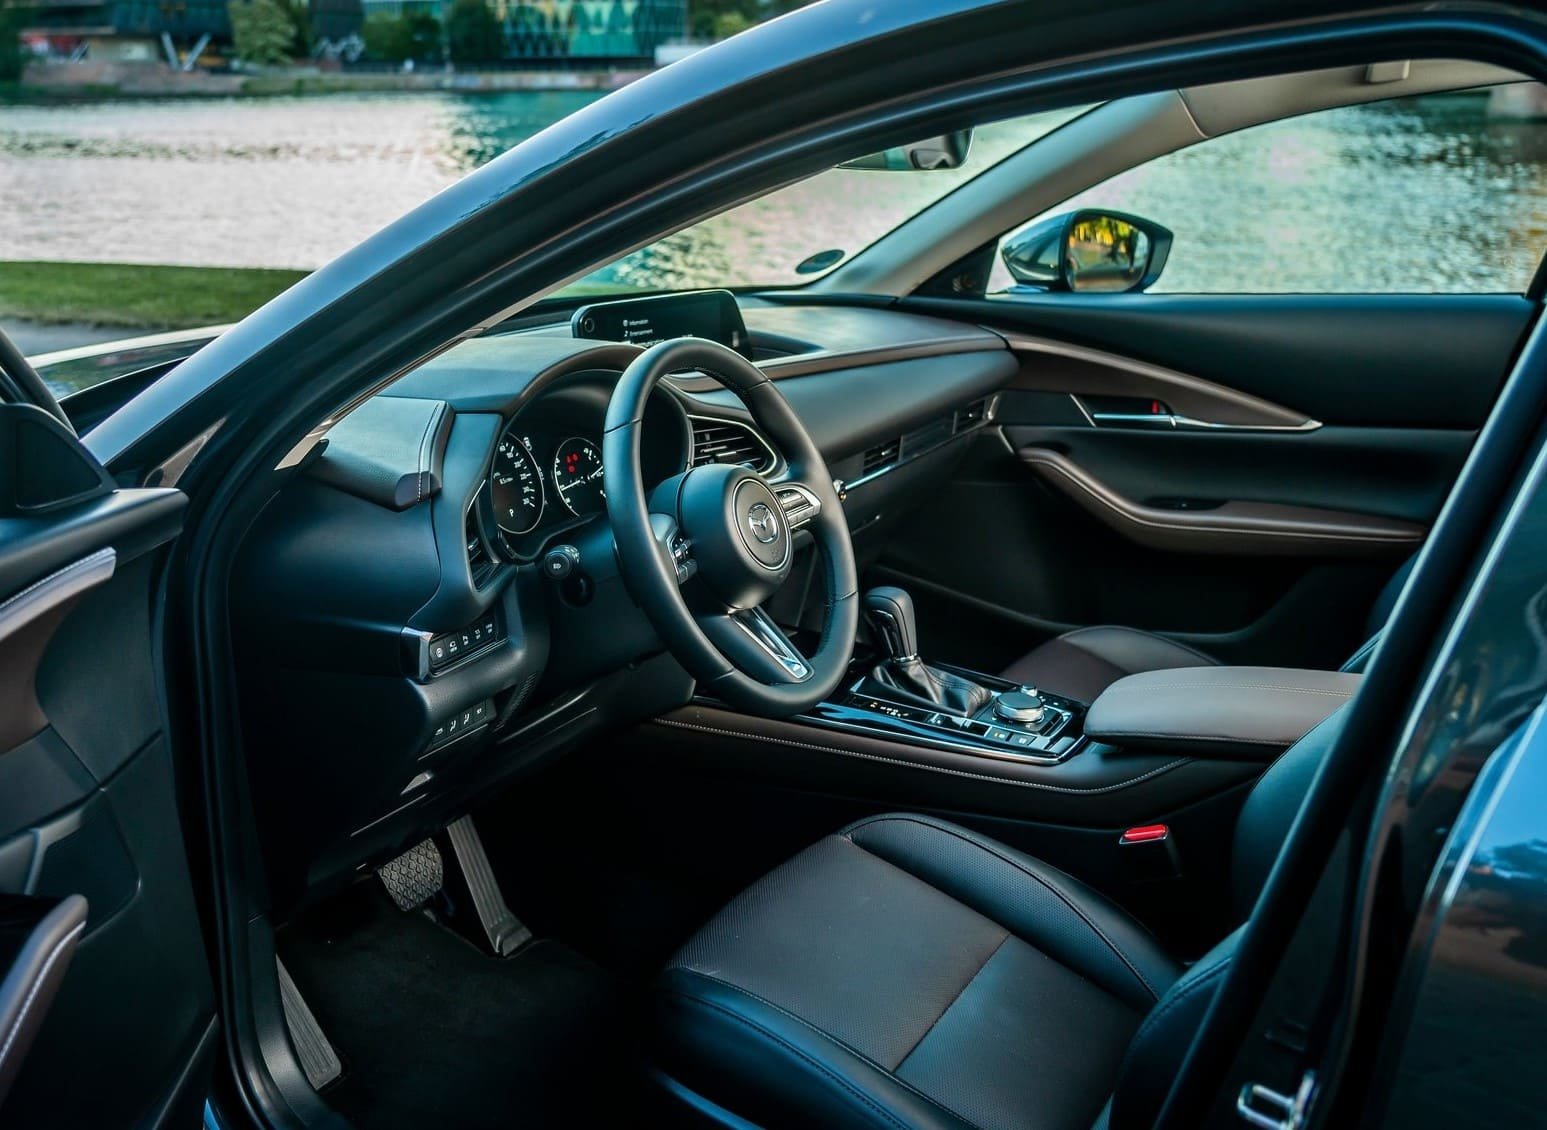 2021 Mazda CX-30 2.5 Turbo_p